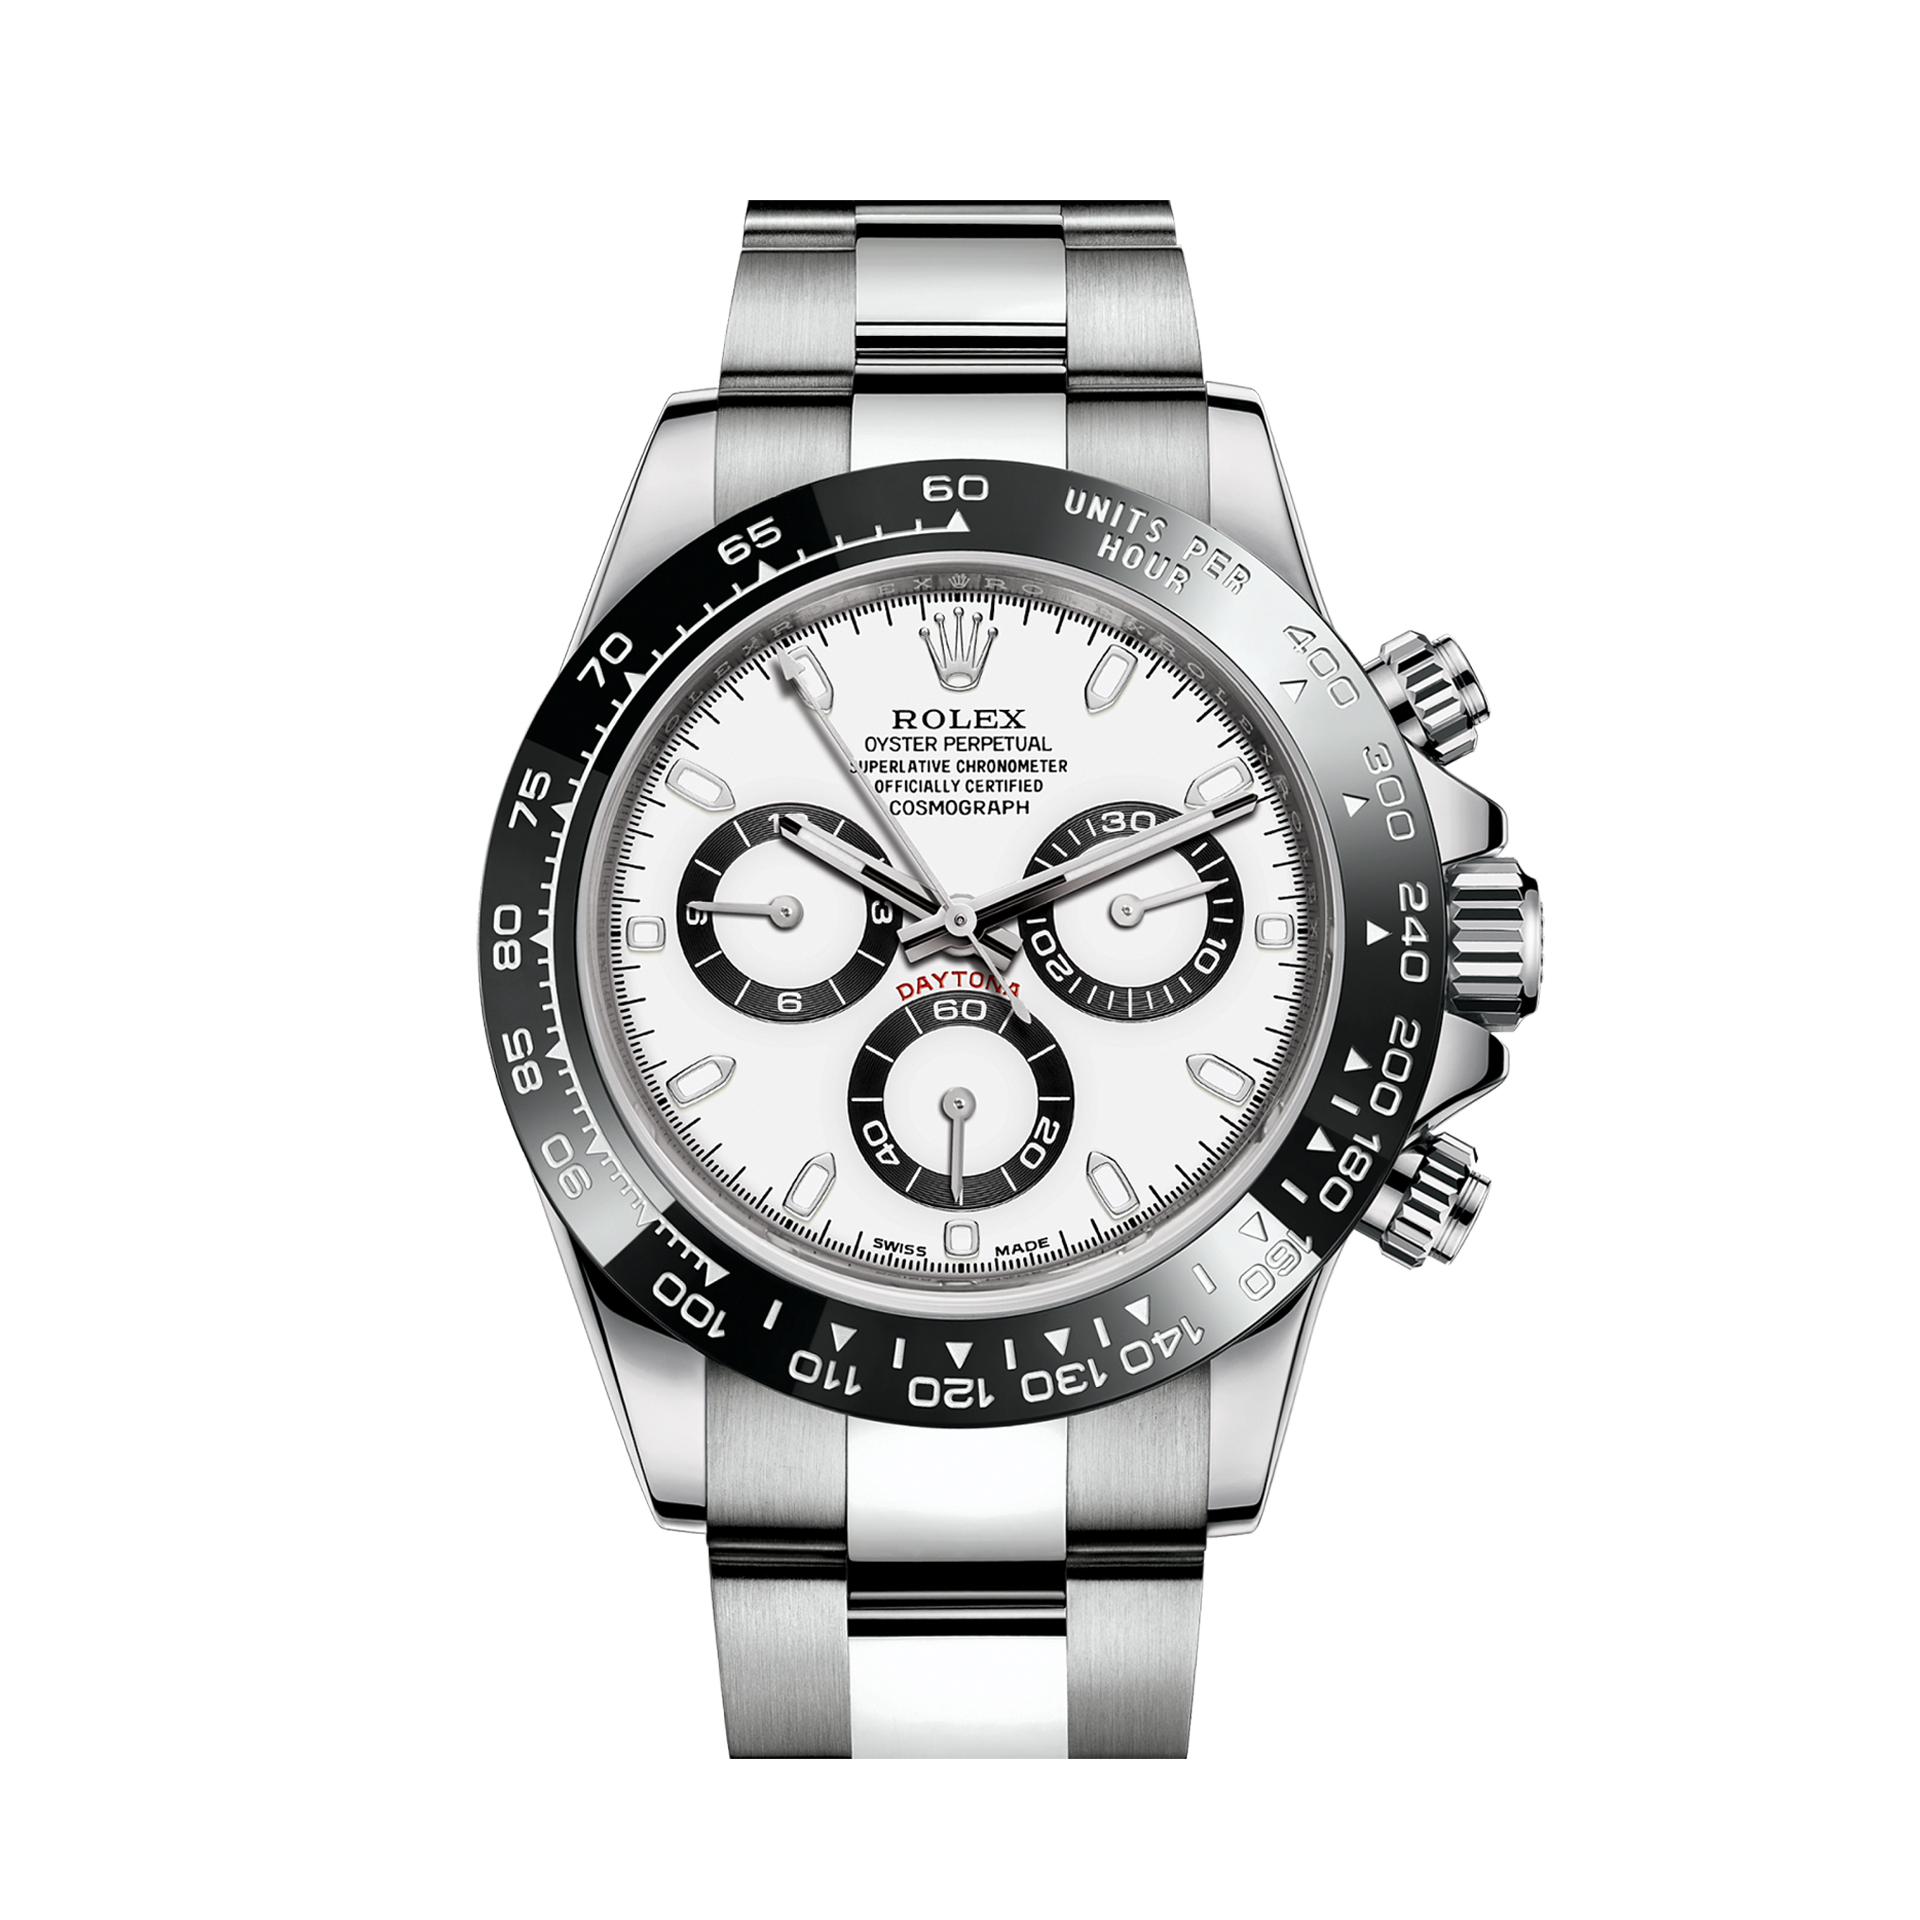 Rolex Cosmograph Daytona 2016 Steel Your Watch Hub